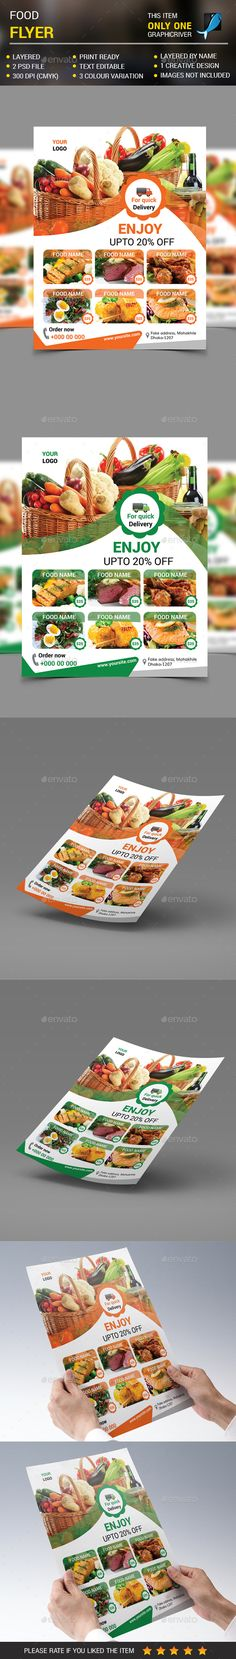 Food Menu Flyer Template PSD